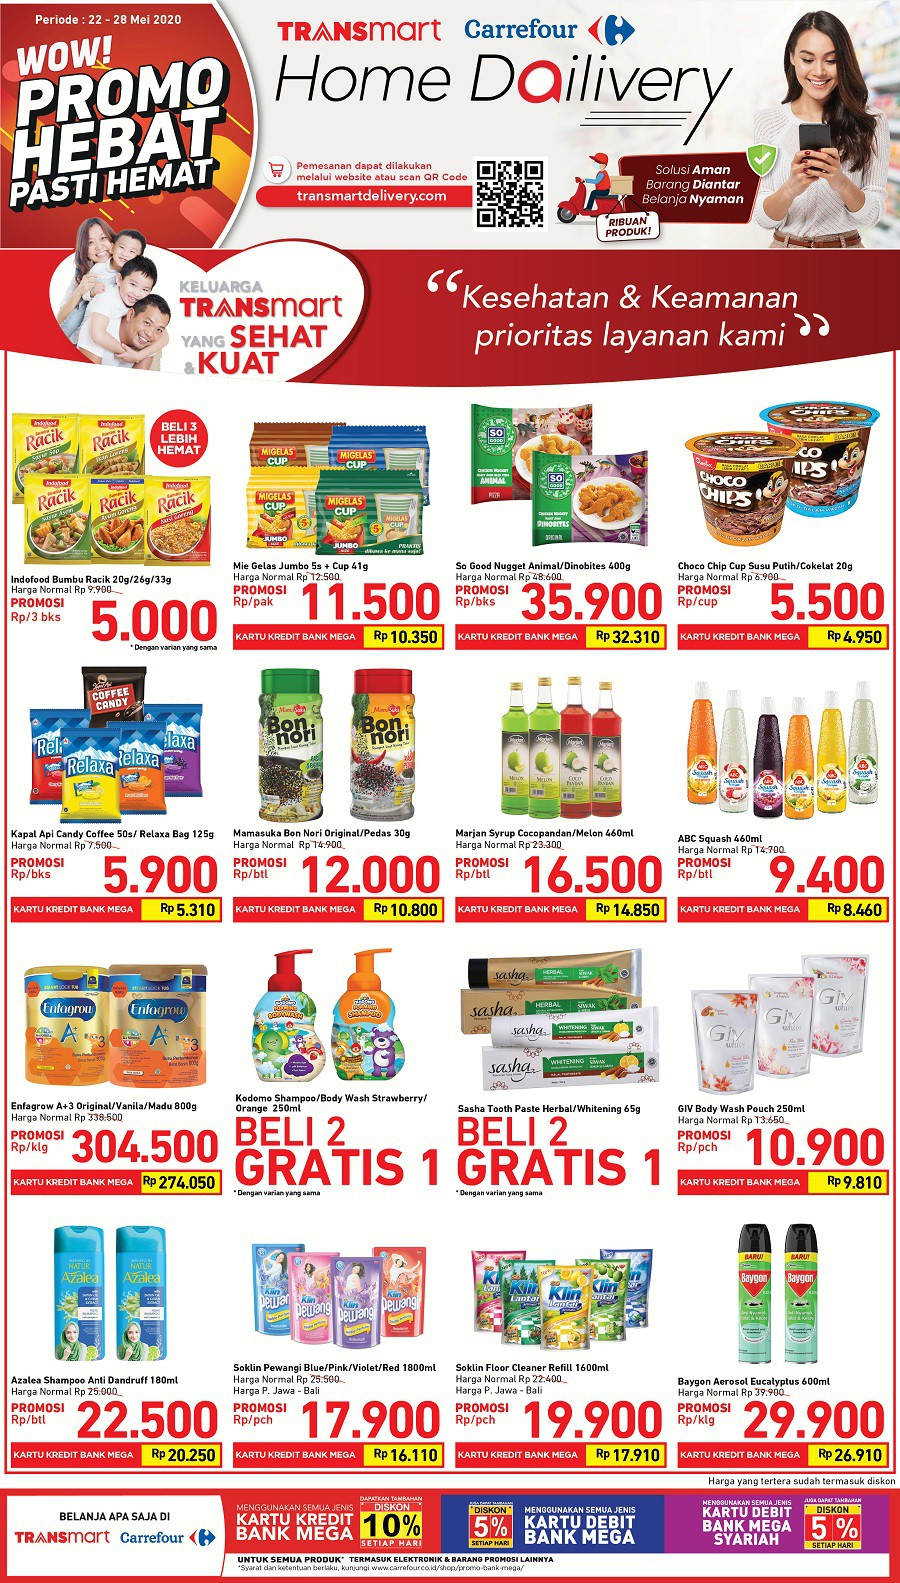 Katalog Promo JSM Transmart Carrefour 22-28 Mei 2020